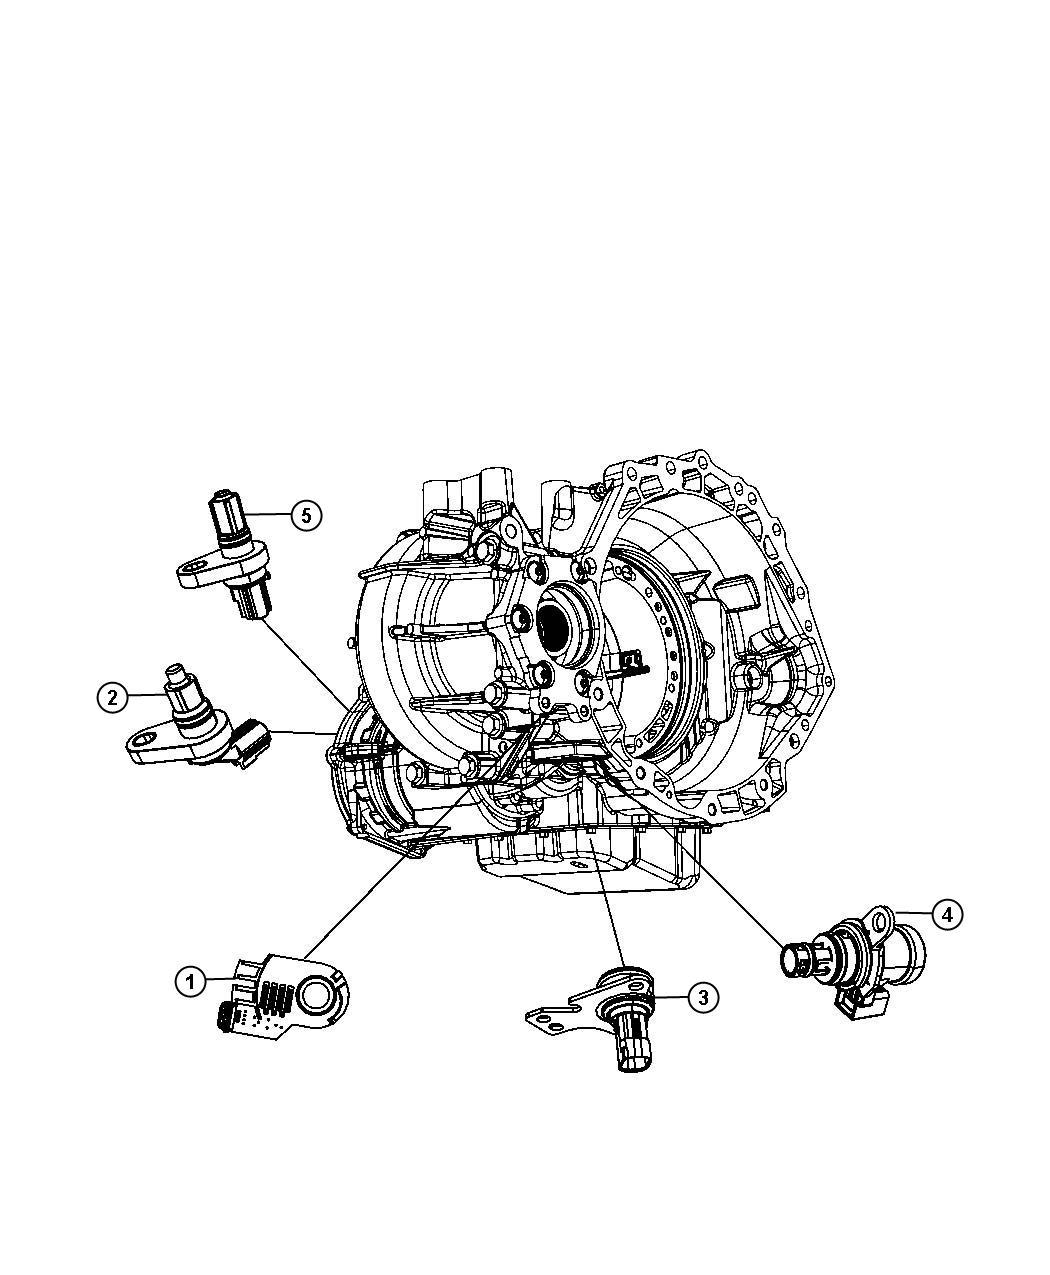 2008 Chrysler Pacifica Sensor. Trans variable force